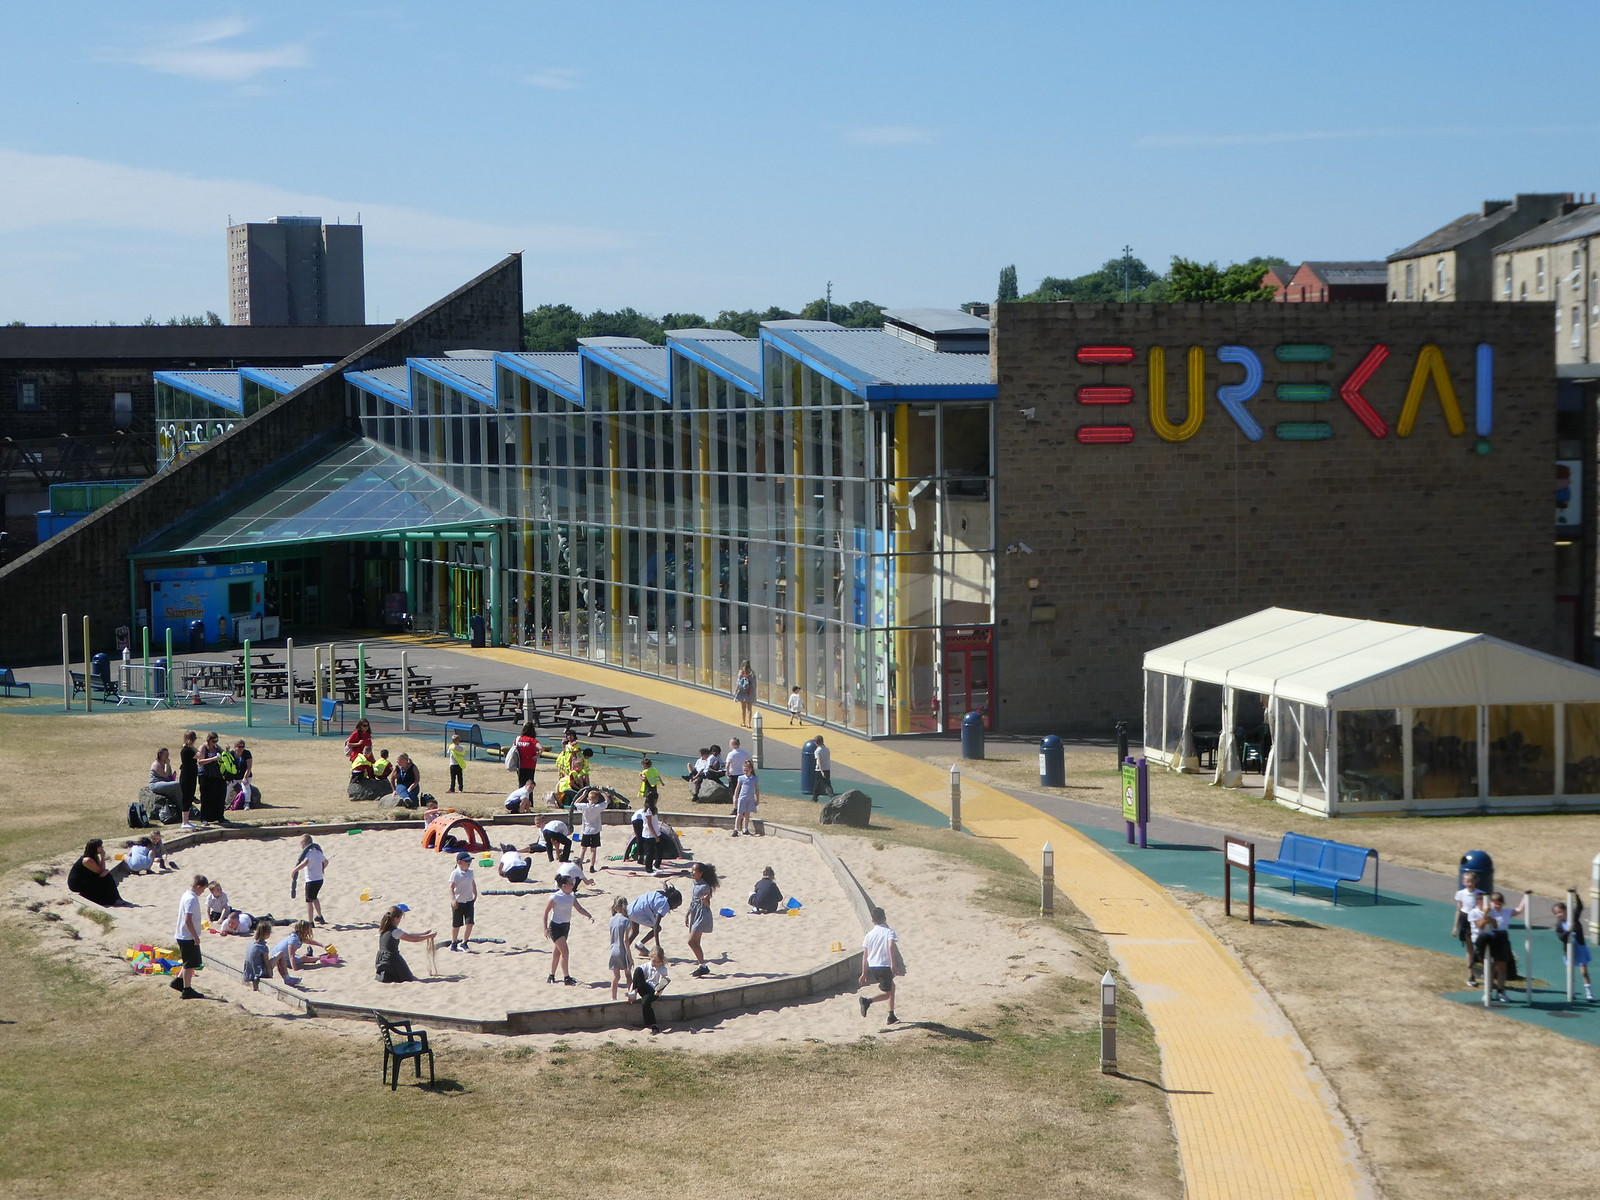 Eureka, National Children's Museum, Halifax